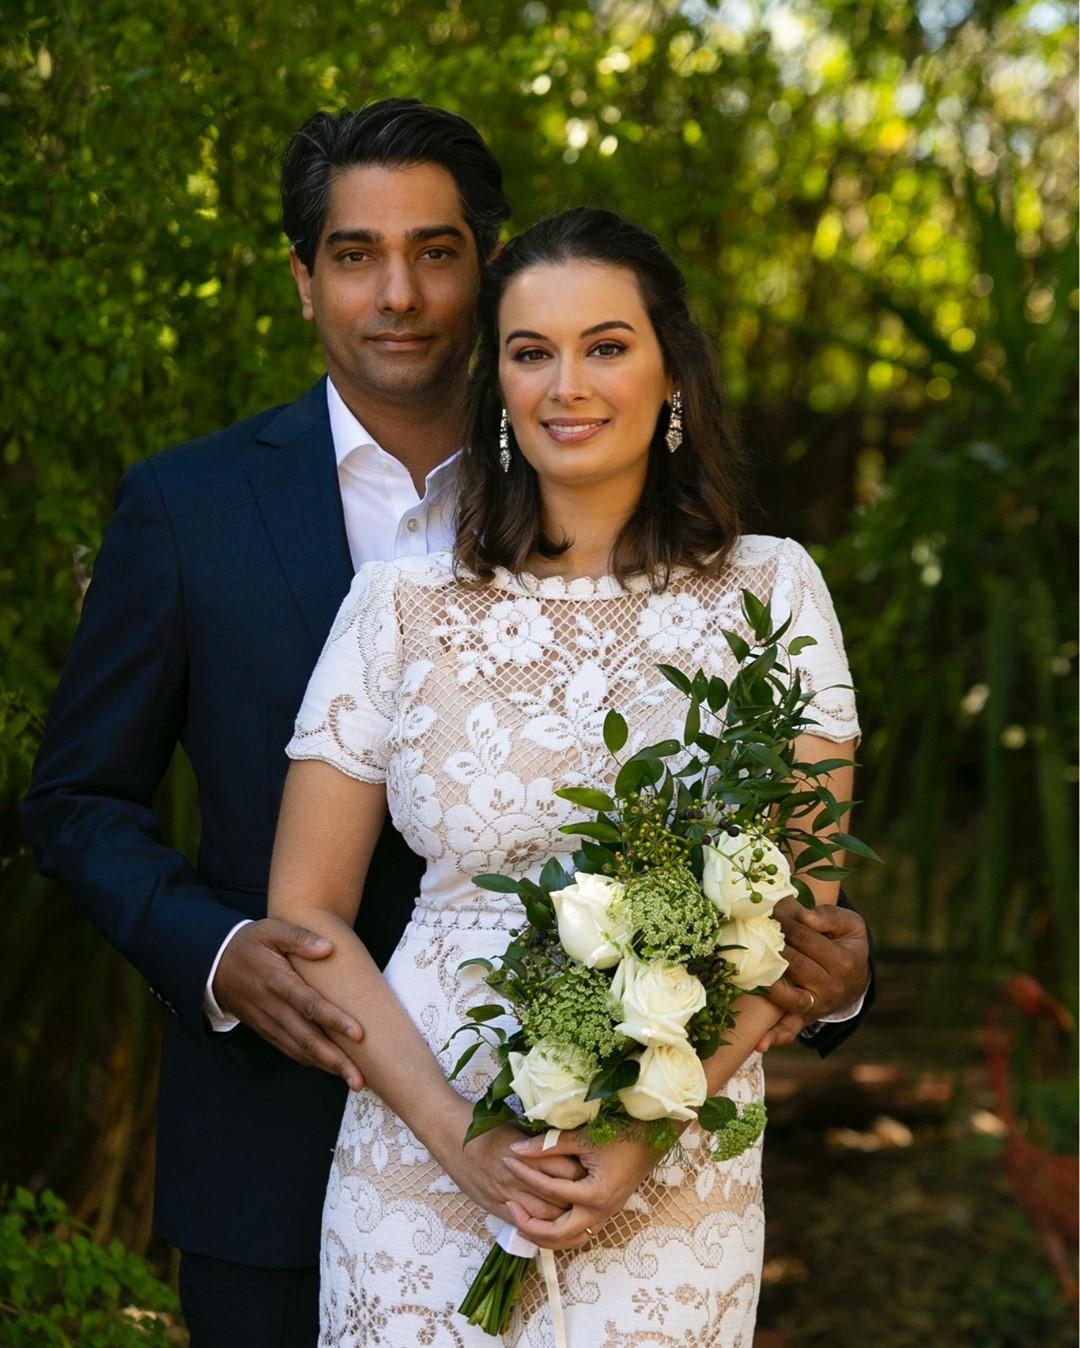 evelyn sharma wedding photo